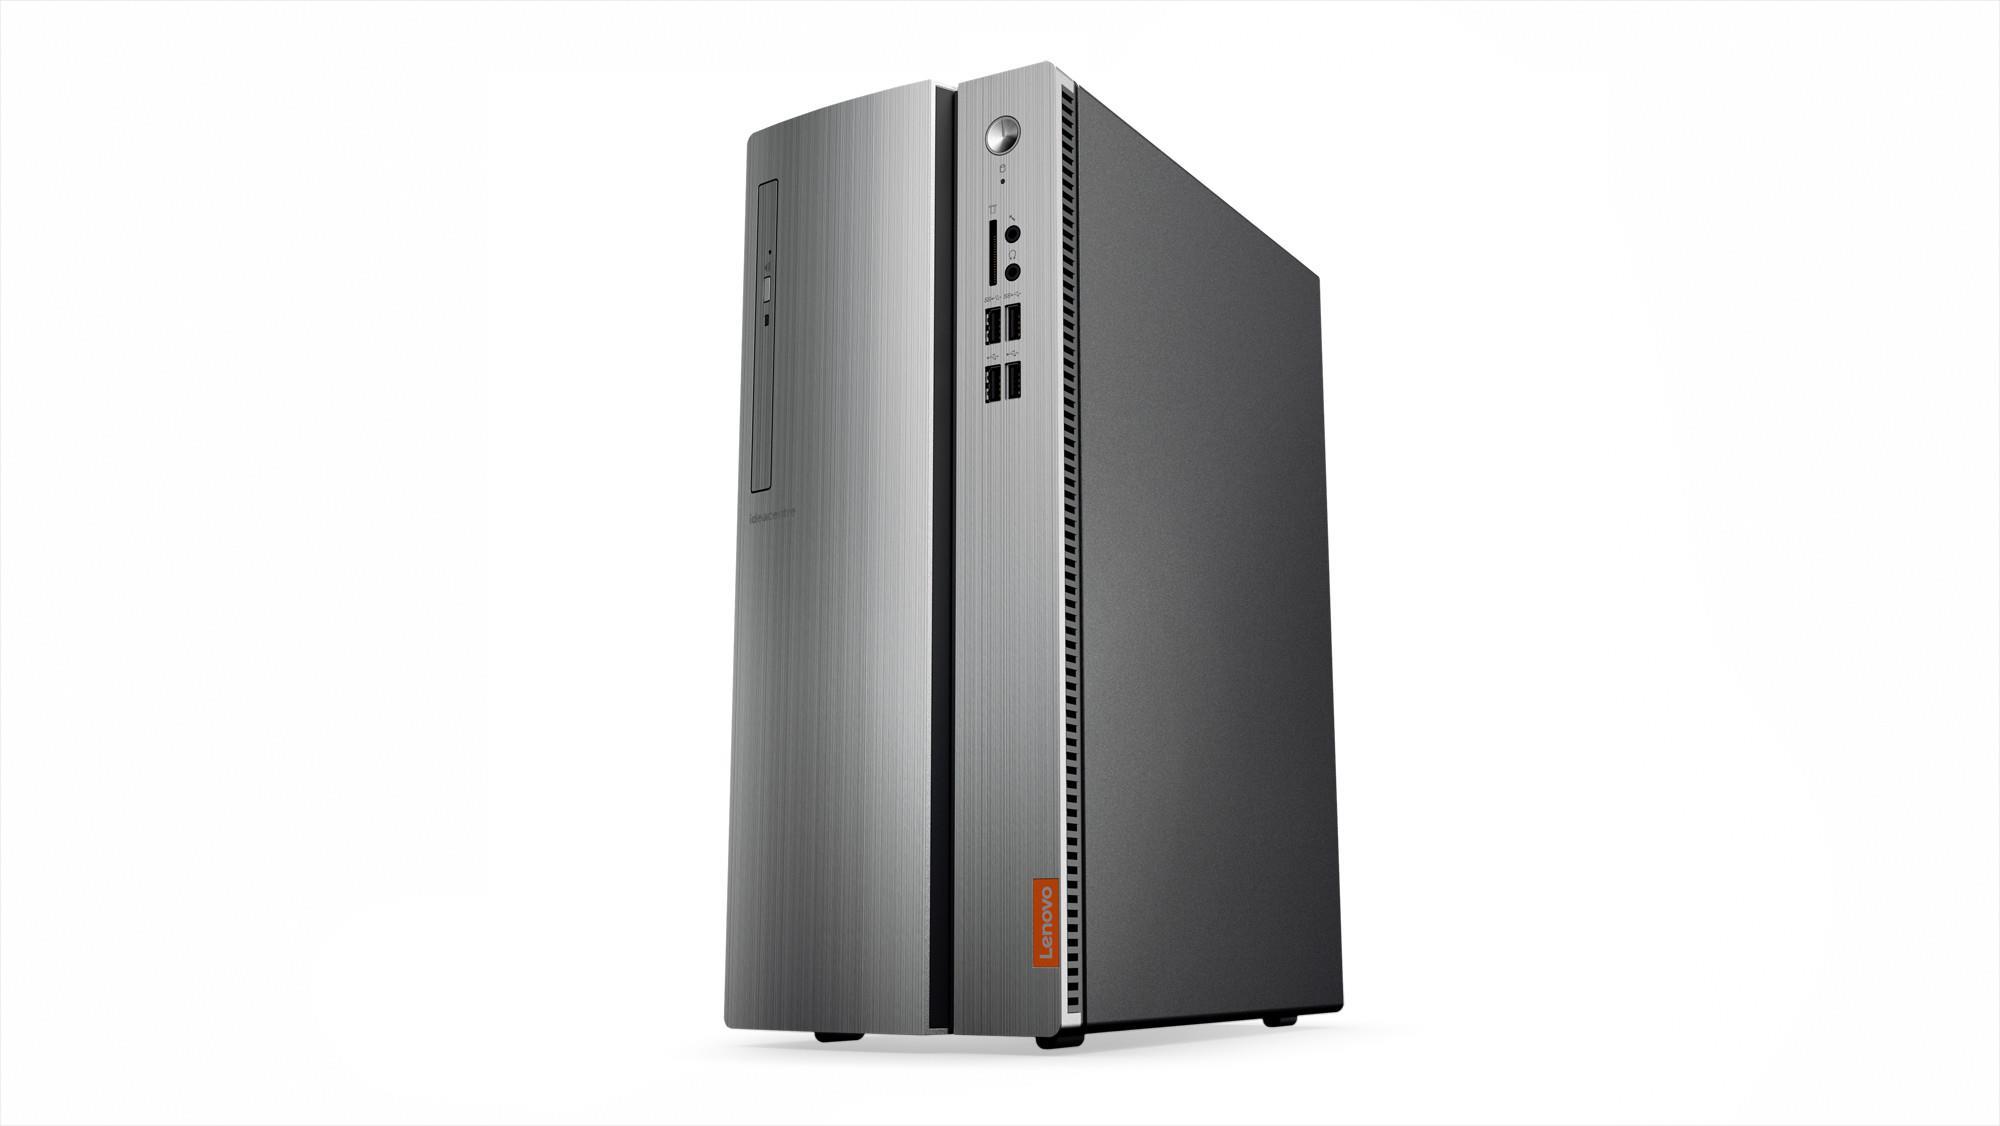 Komputer PC Lenovo IdeaCentre 510-15IKL i5-7400 8GB 1TB GTX1050-2GB